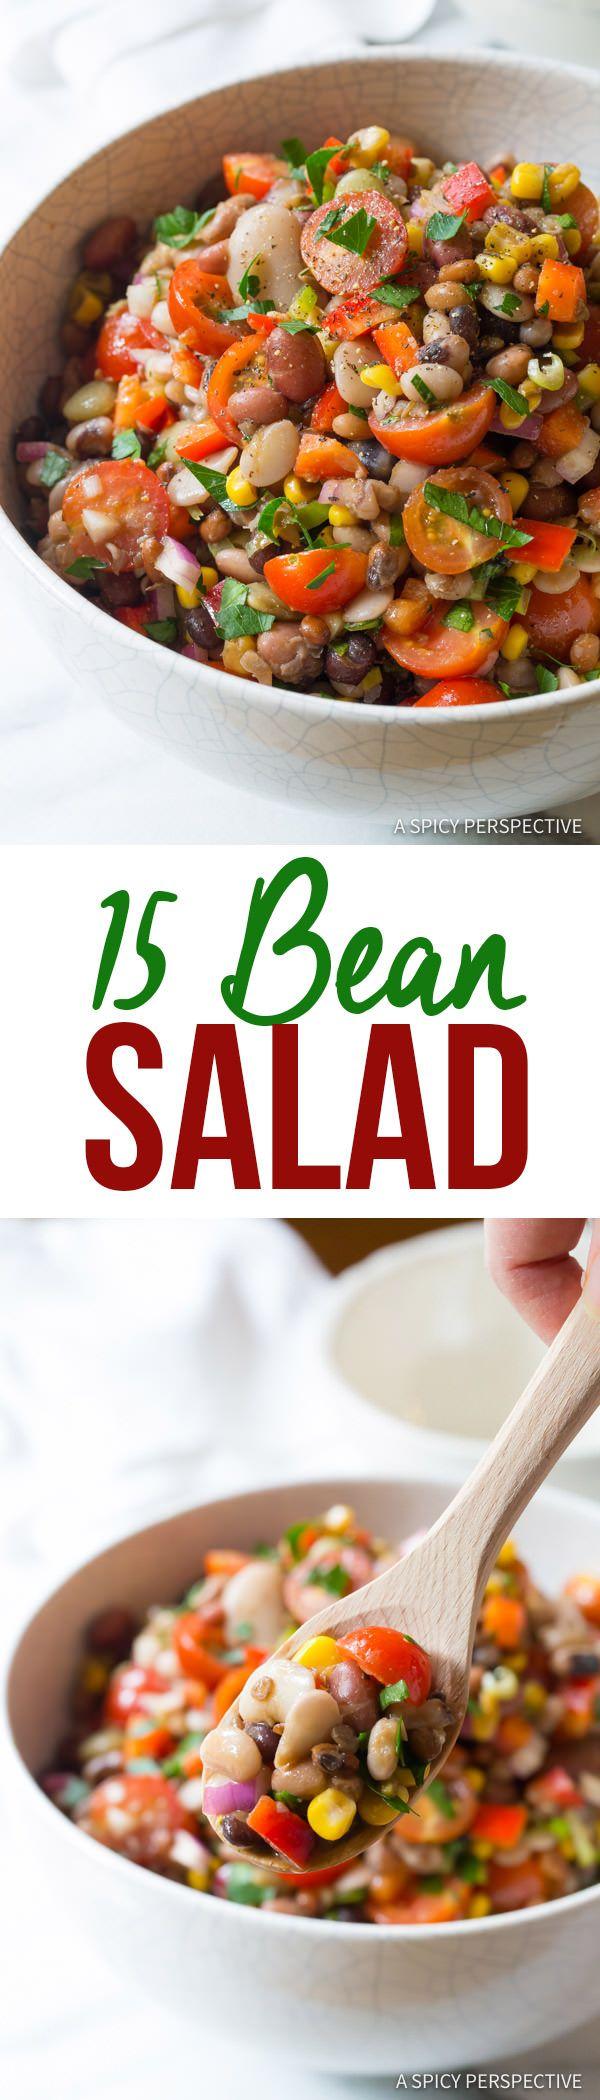 Fresh Healthy 15 Bean Salad Recipe | ASpicyPerspective.com